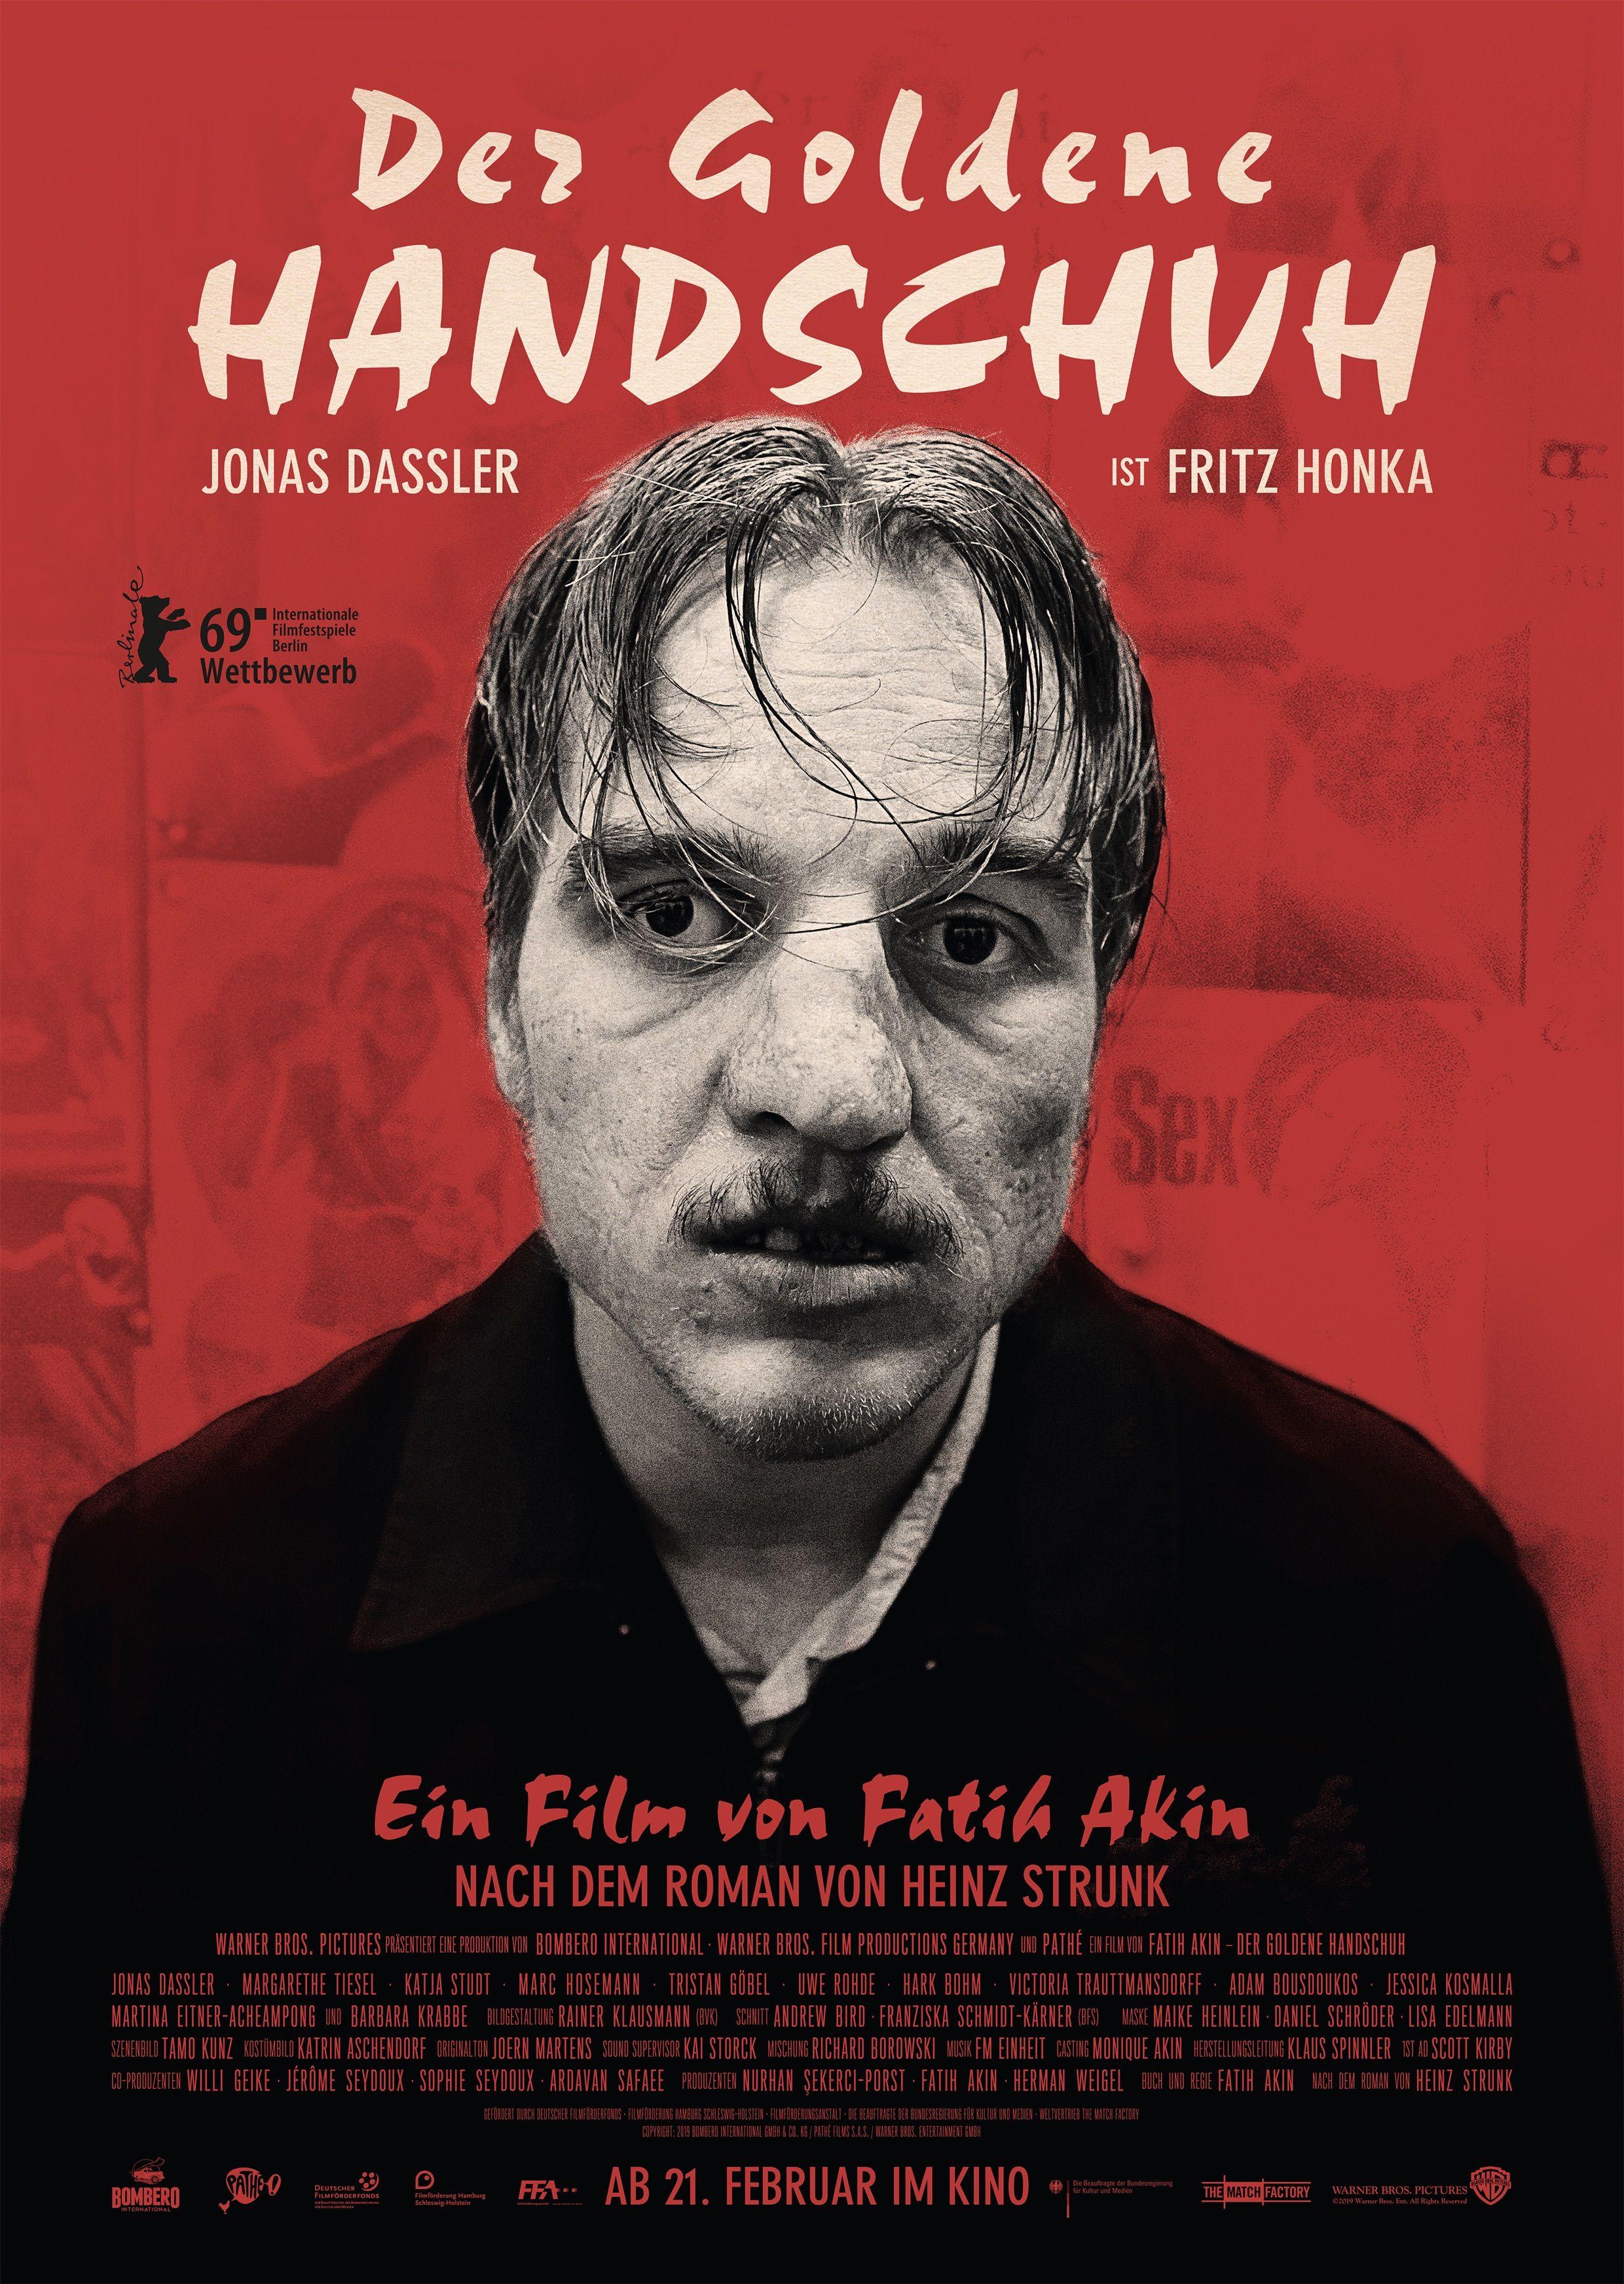 Deutsche kinofilme 2019